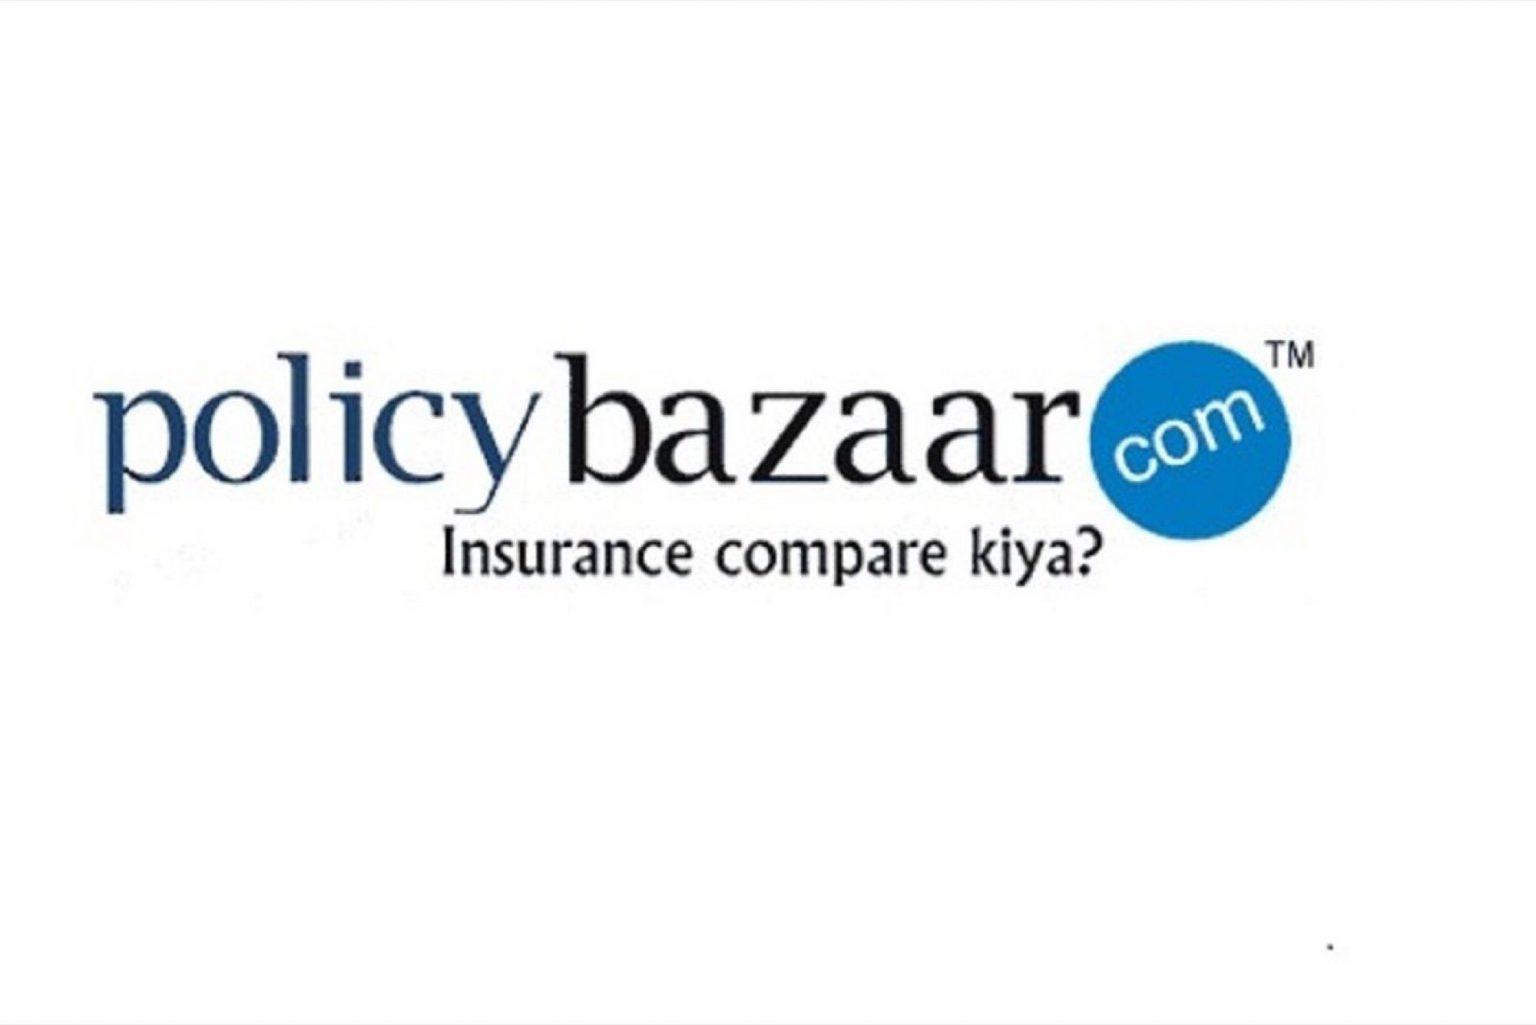 Policybazaar gets insurance broking licence|പോളിസിബസാറിന് ഇൻഷുറൻസ് ബ്രോക്കിംഗ് ലൈസൻസ് ലഭിക്കുന്നു_40.1